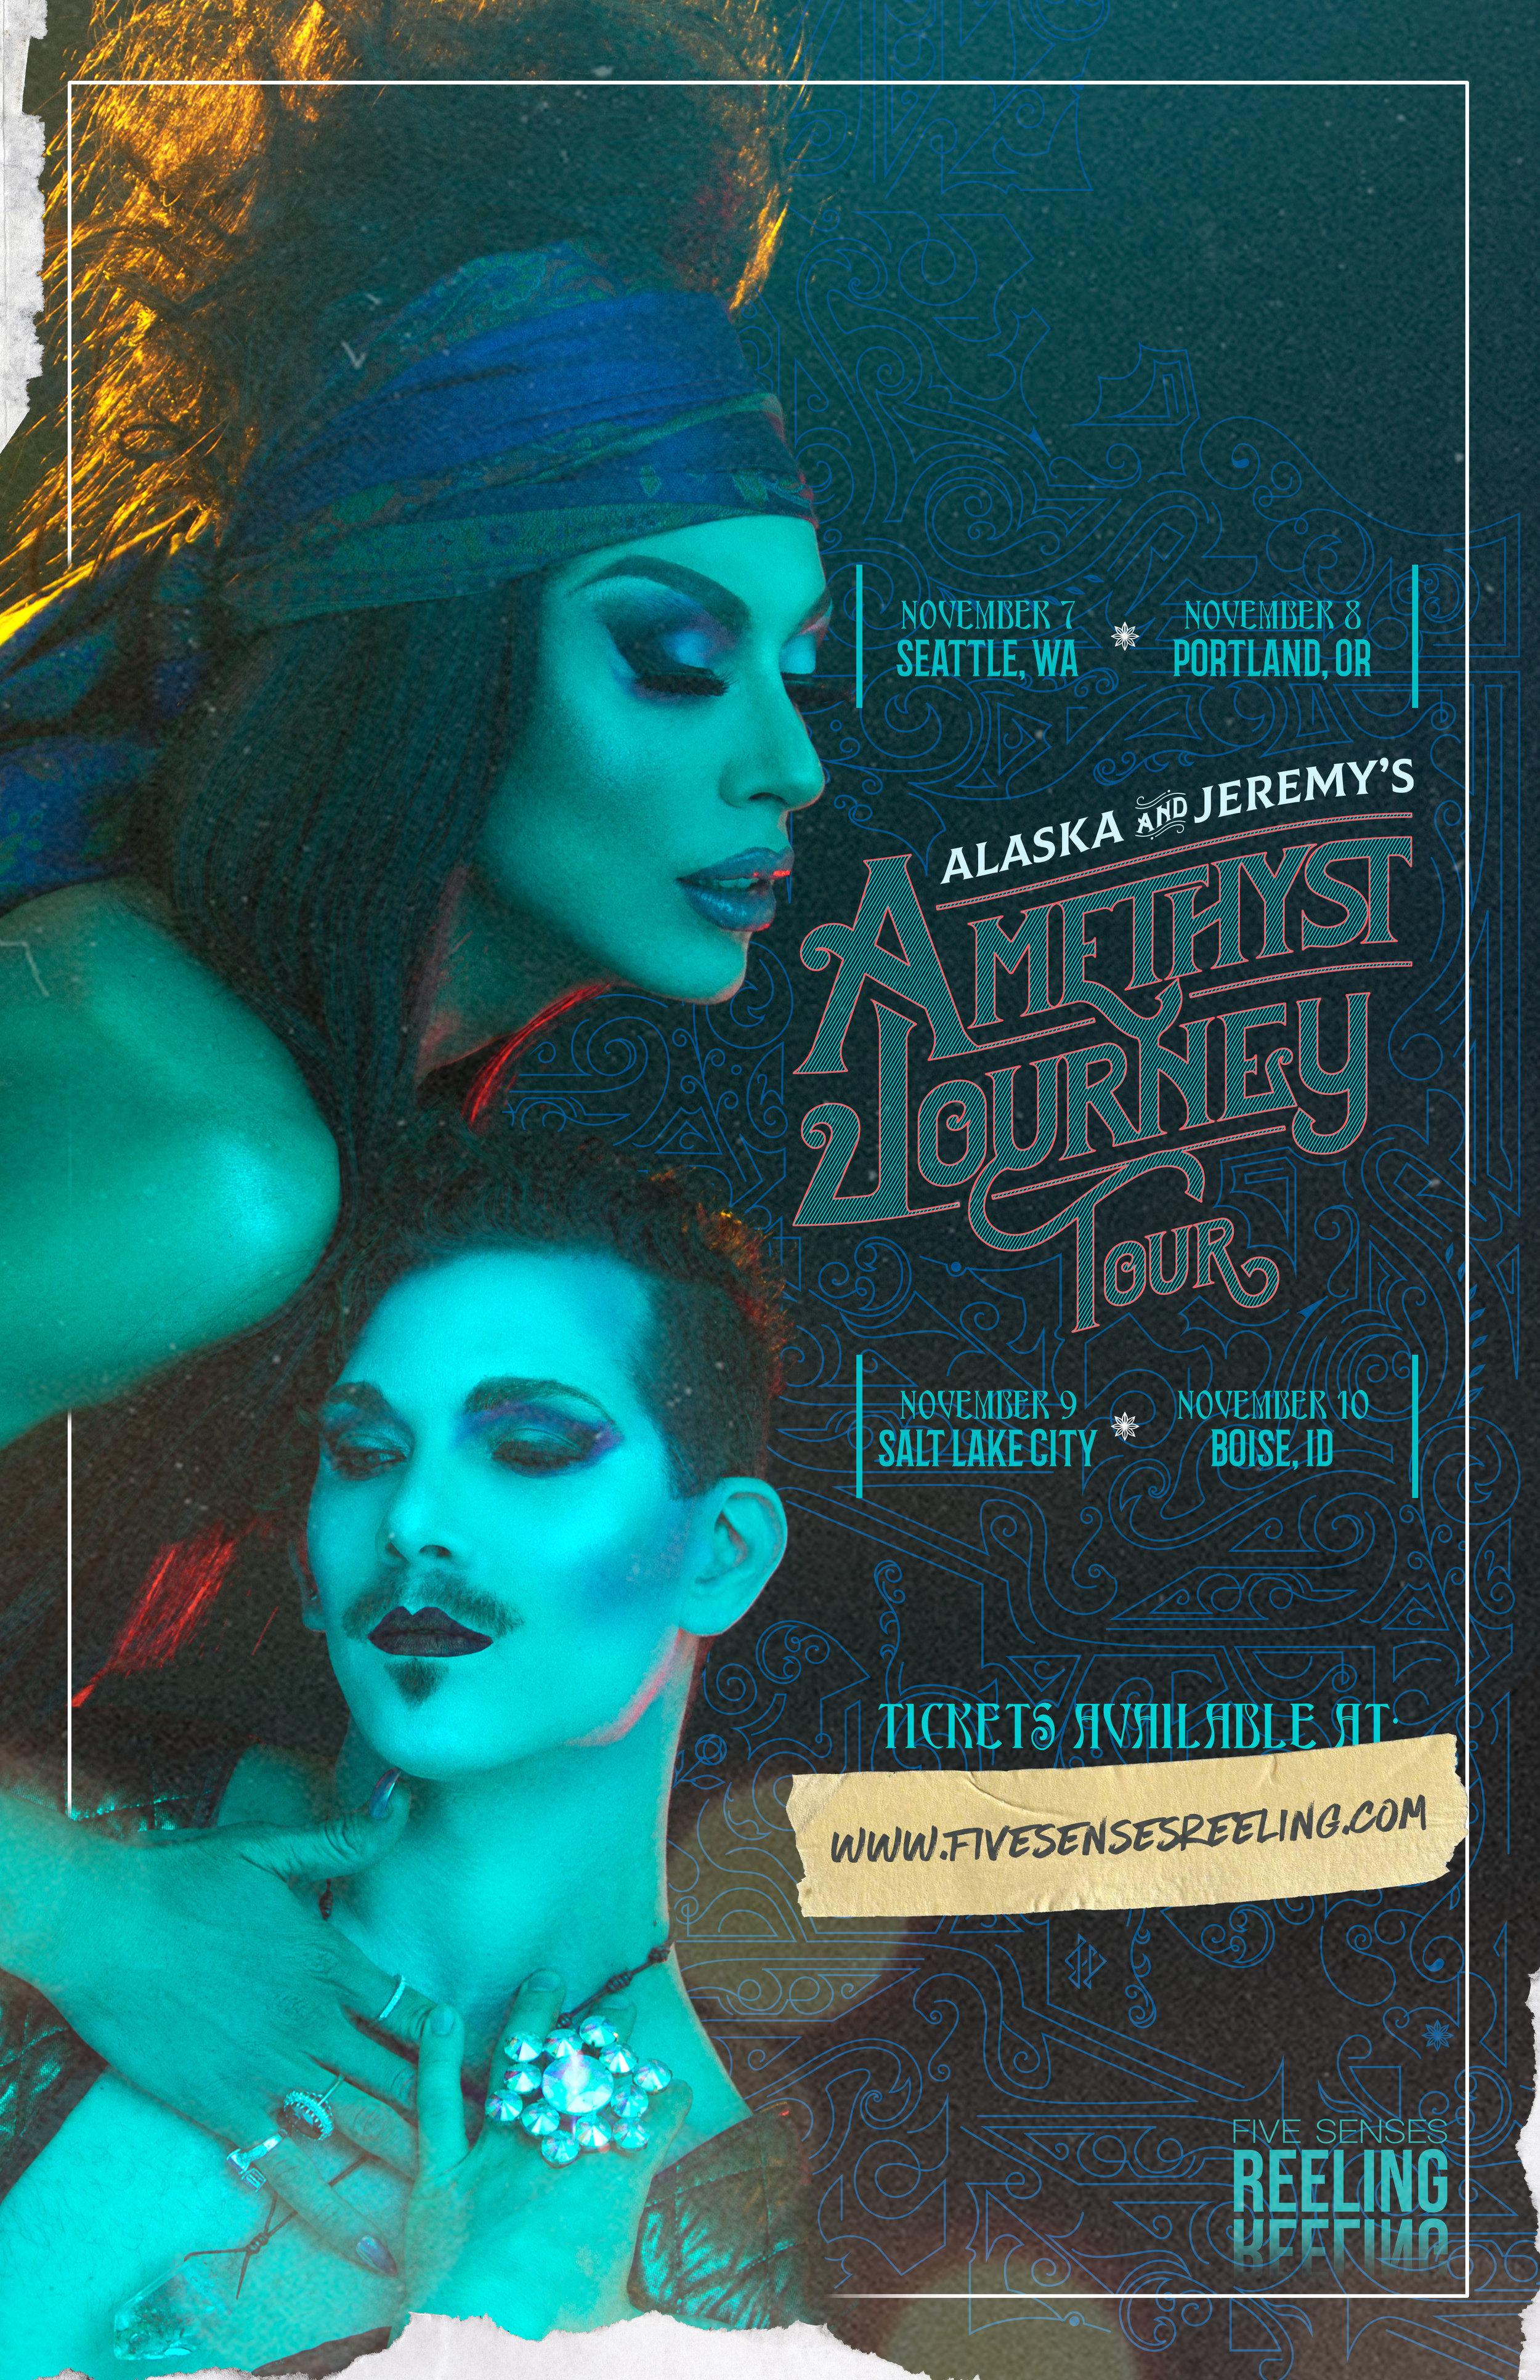 Amethyst-Journey-Tour-19-poster-11x17.jpg